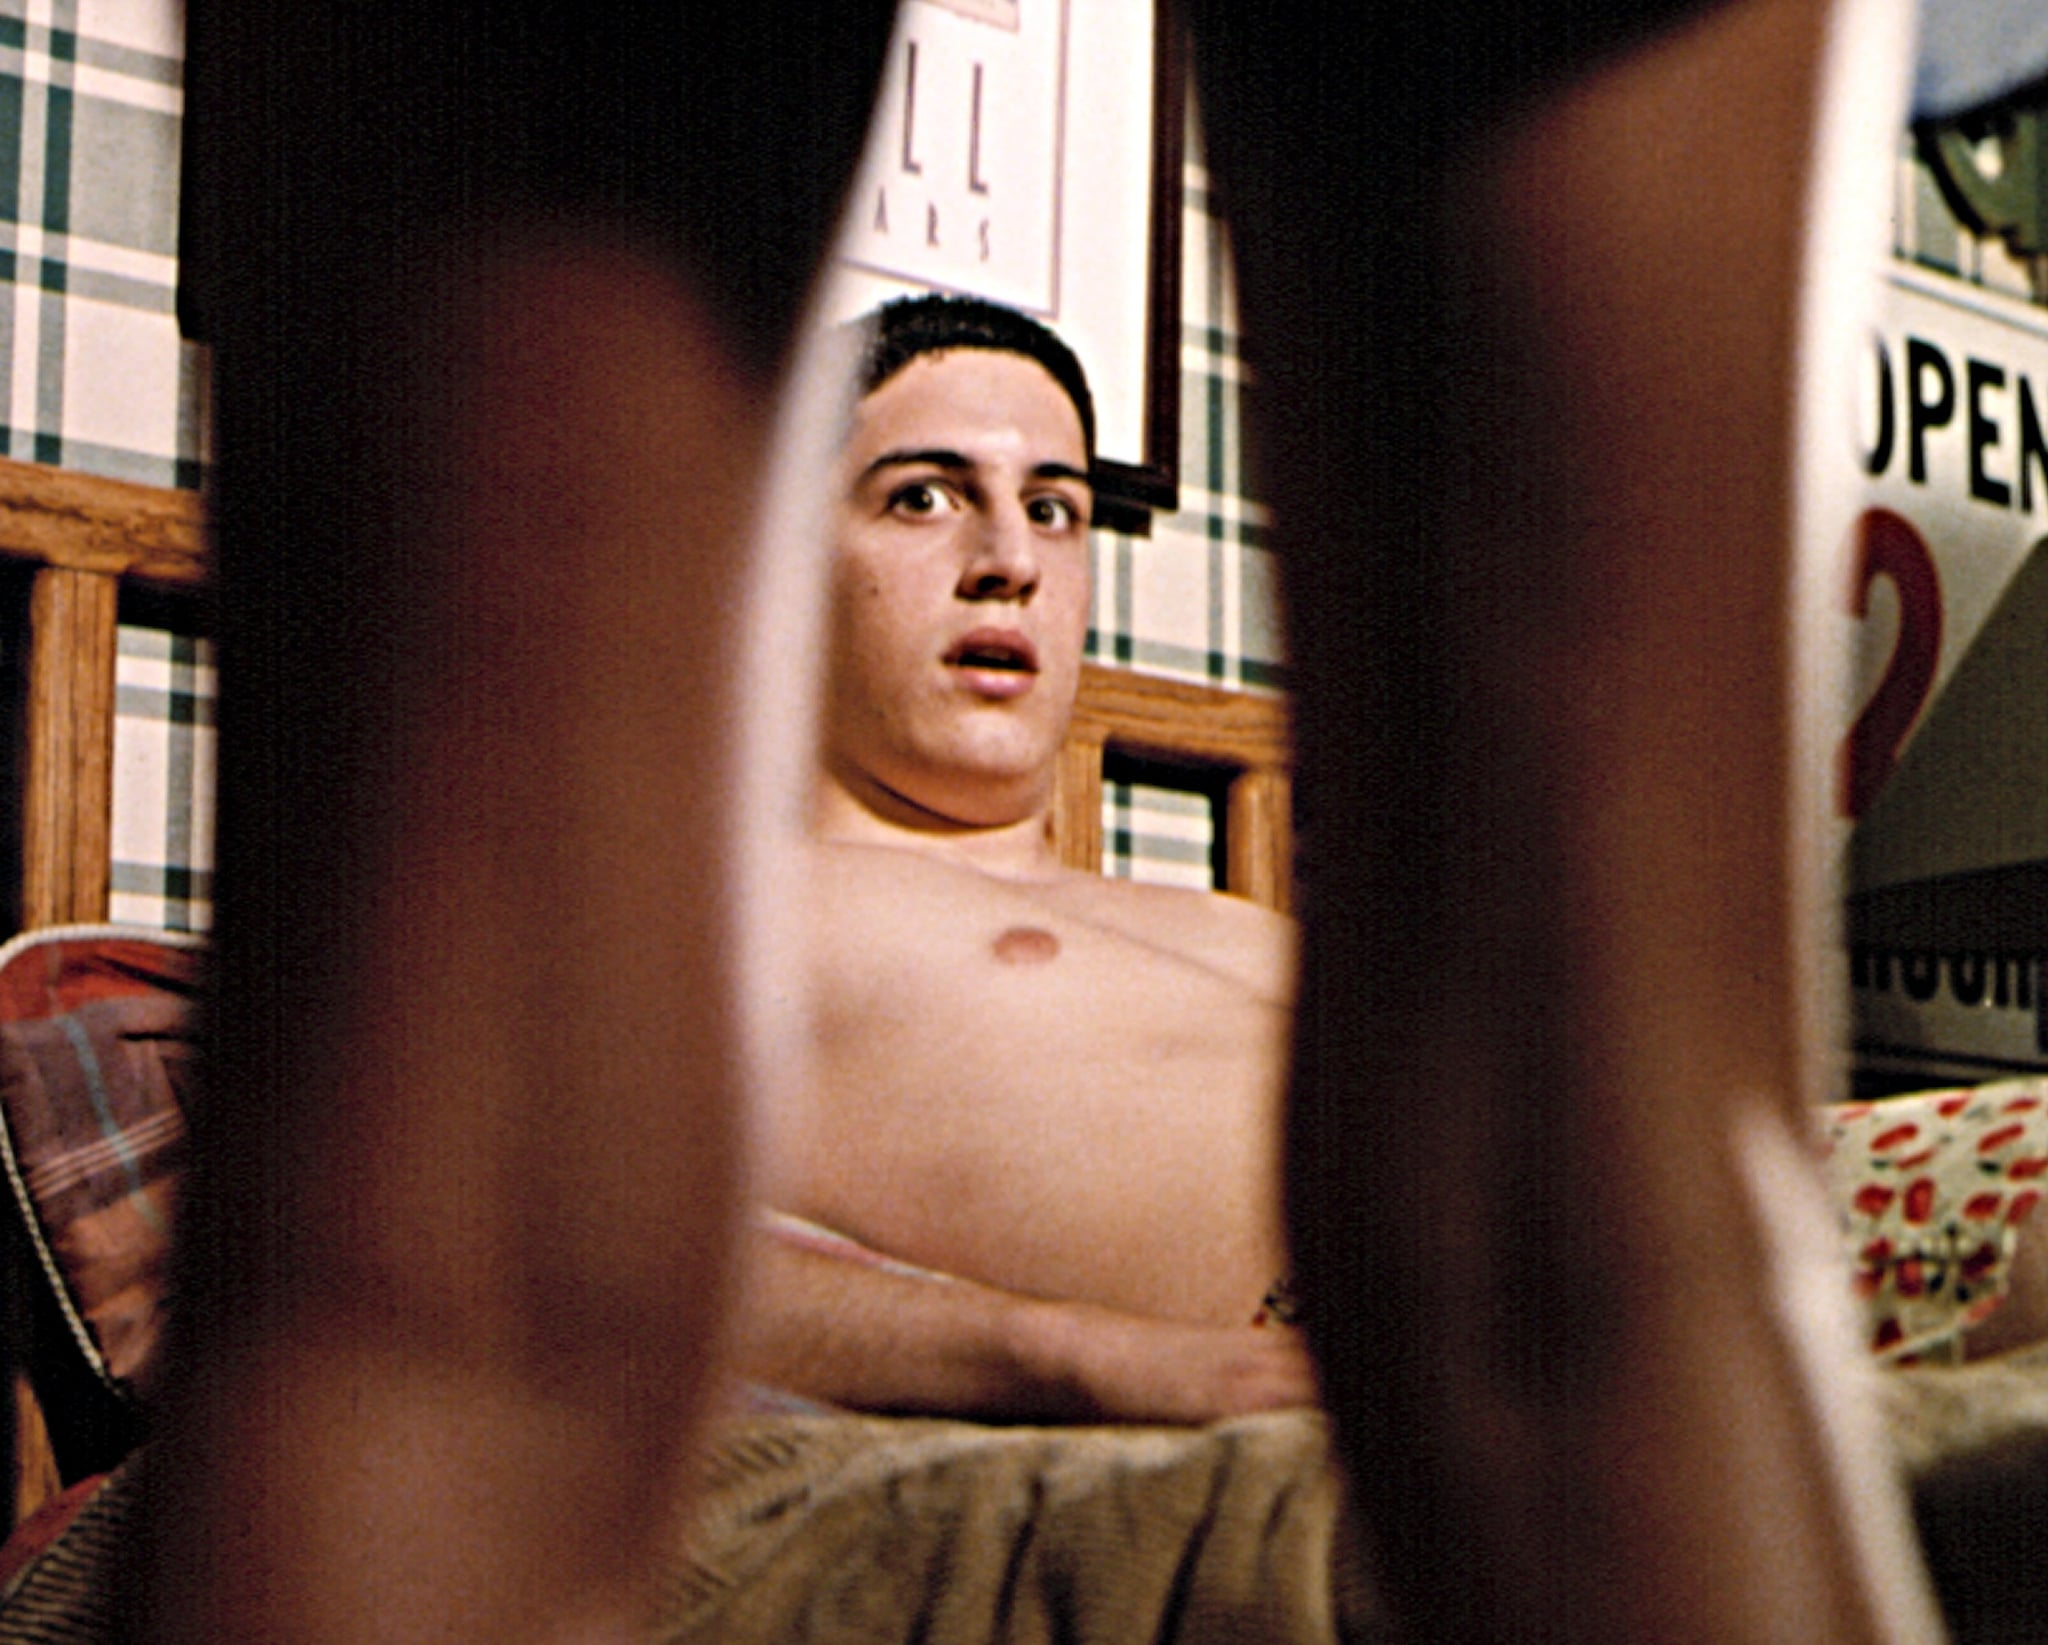 American Pie Sex Images jim levenstein, american pie | pop culture's most beloved